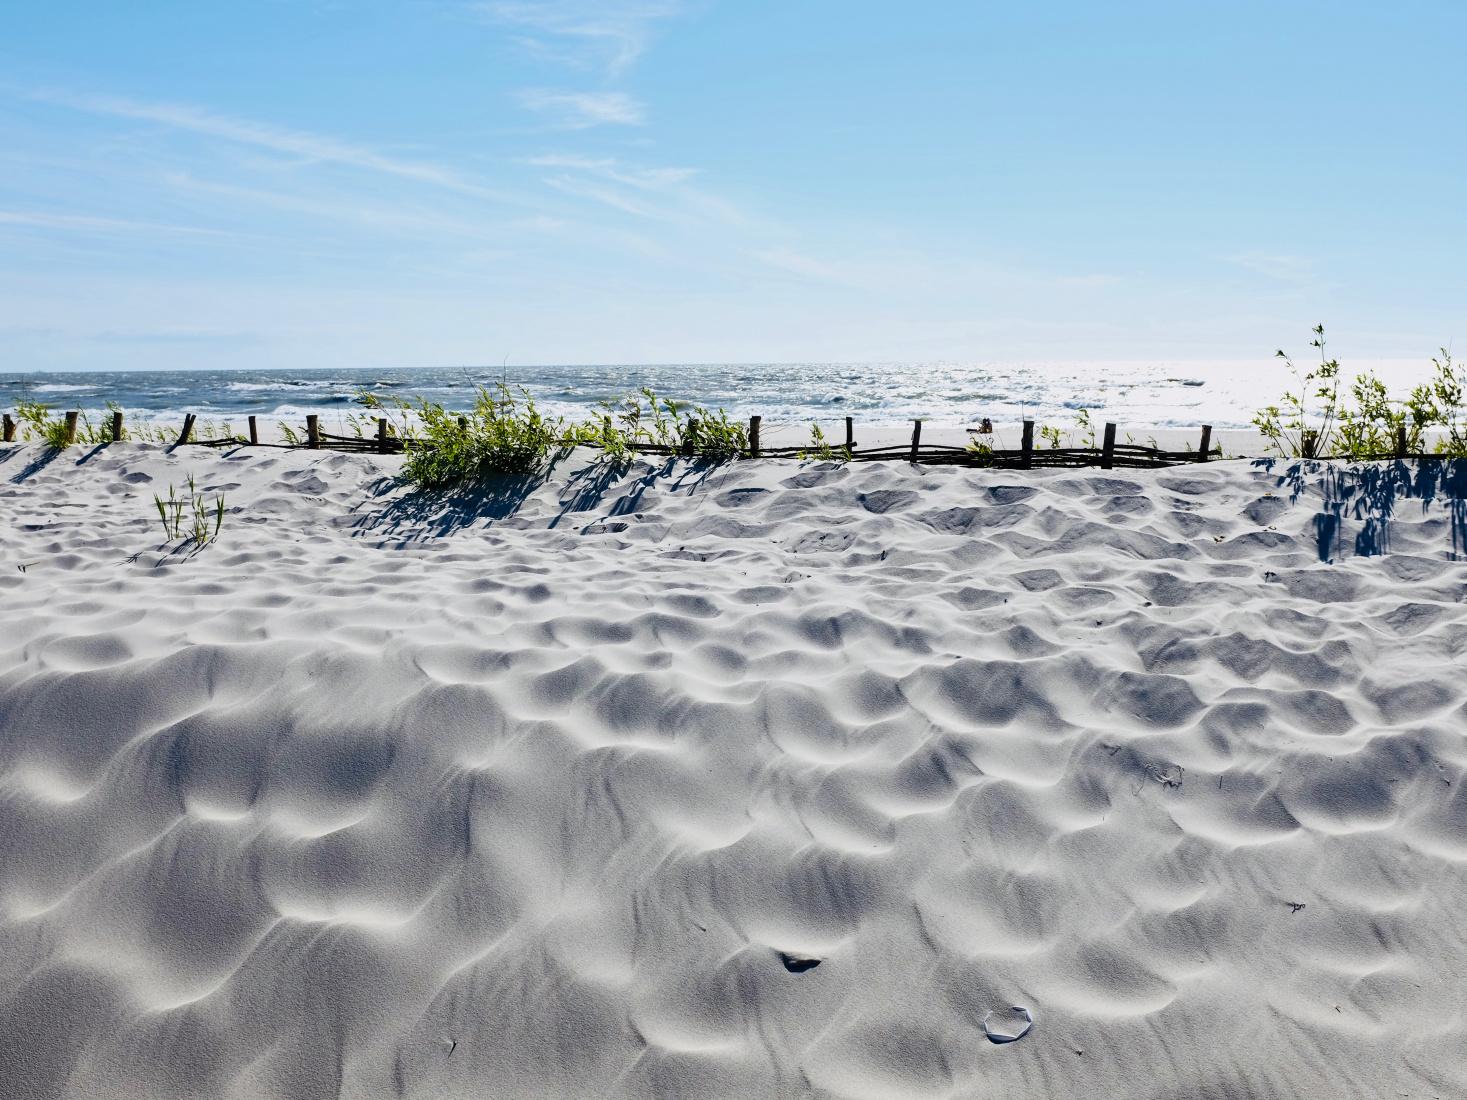 Beautiful white sand beach in Yantarny, outside Kaliningrad, Russia.